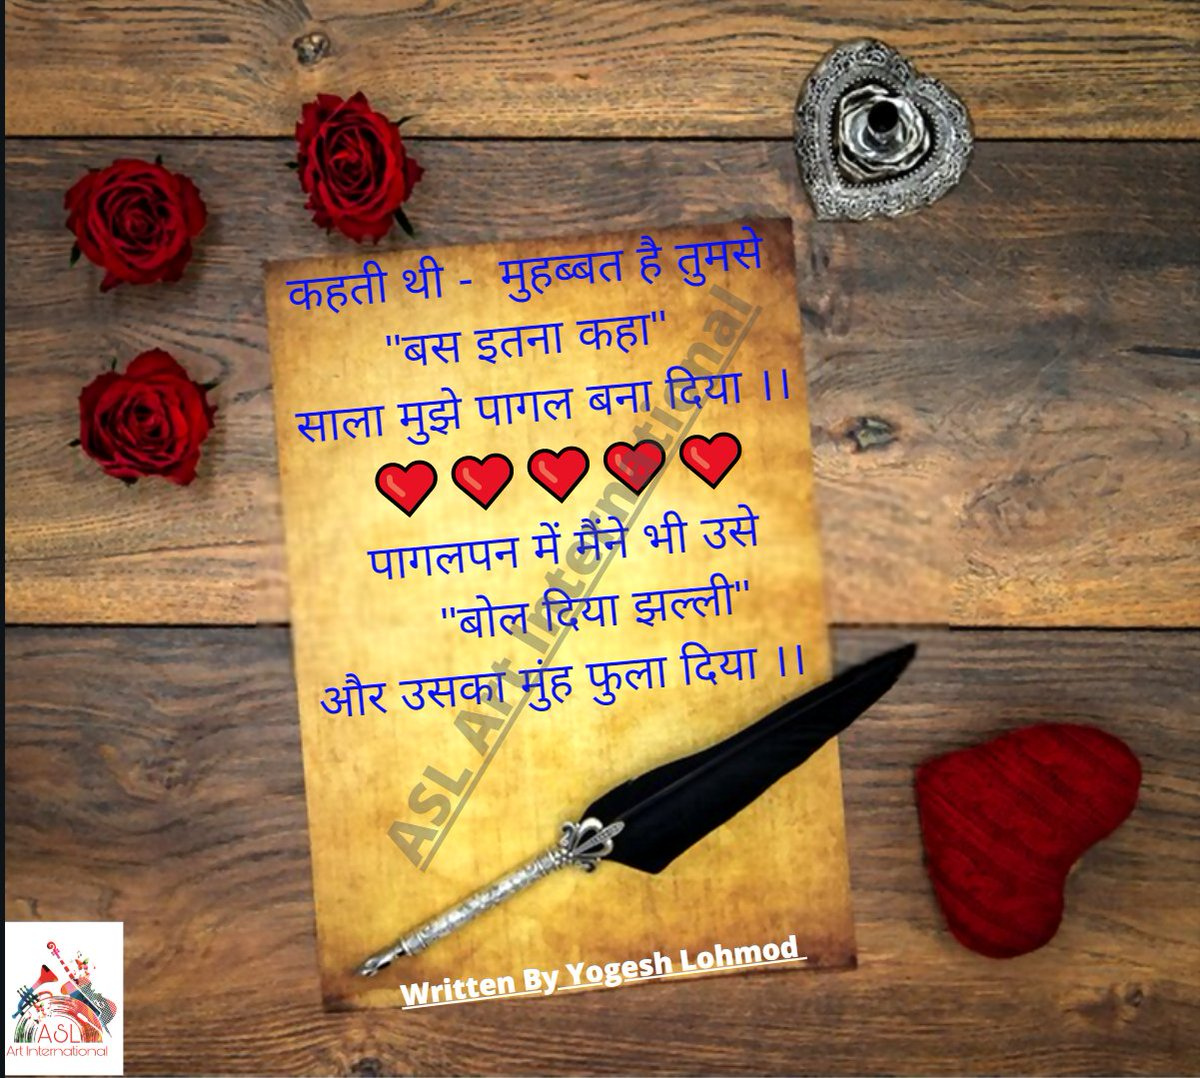 #aslartinternational #hindishayaris #shayari #shayarilover #hindiwritersofig #shayrilover #hindiquotes #writersofig #hindiwriter #hindishayar #shayr #loveshayri #shayara #hindipoetry #shayariworld #indianshayari #writers_den_pic.twitter.com/ofgN5255z1